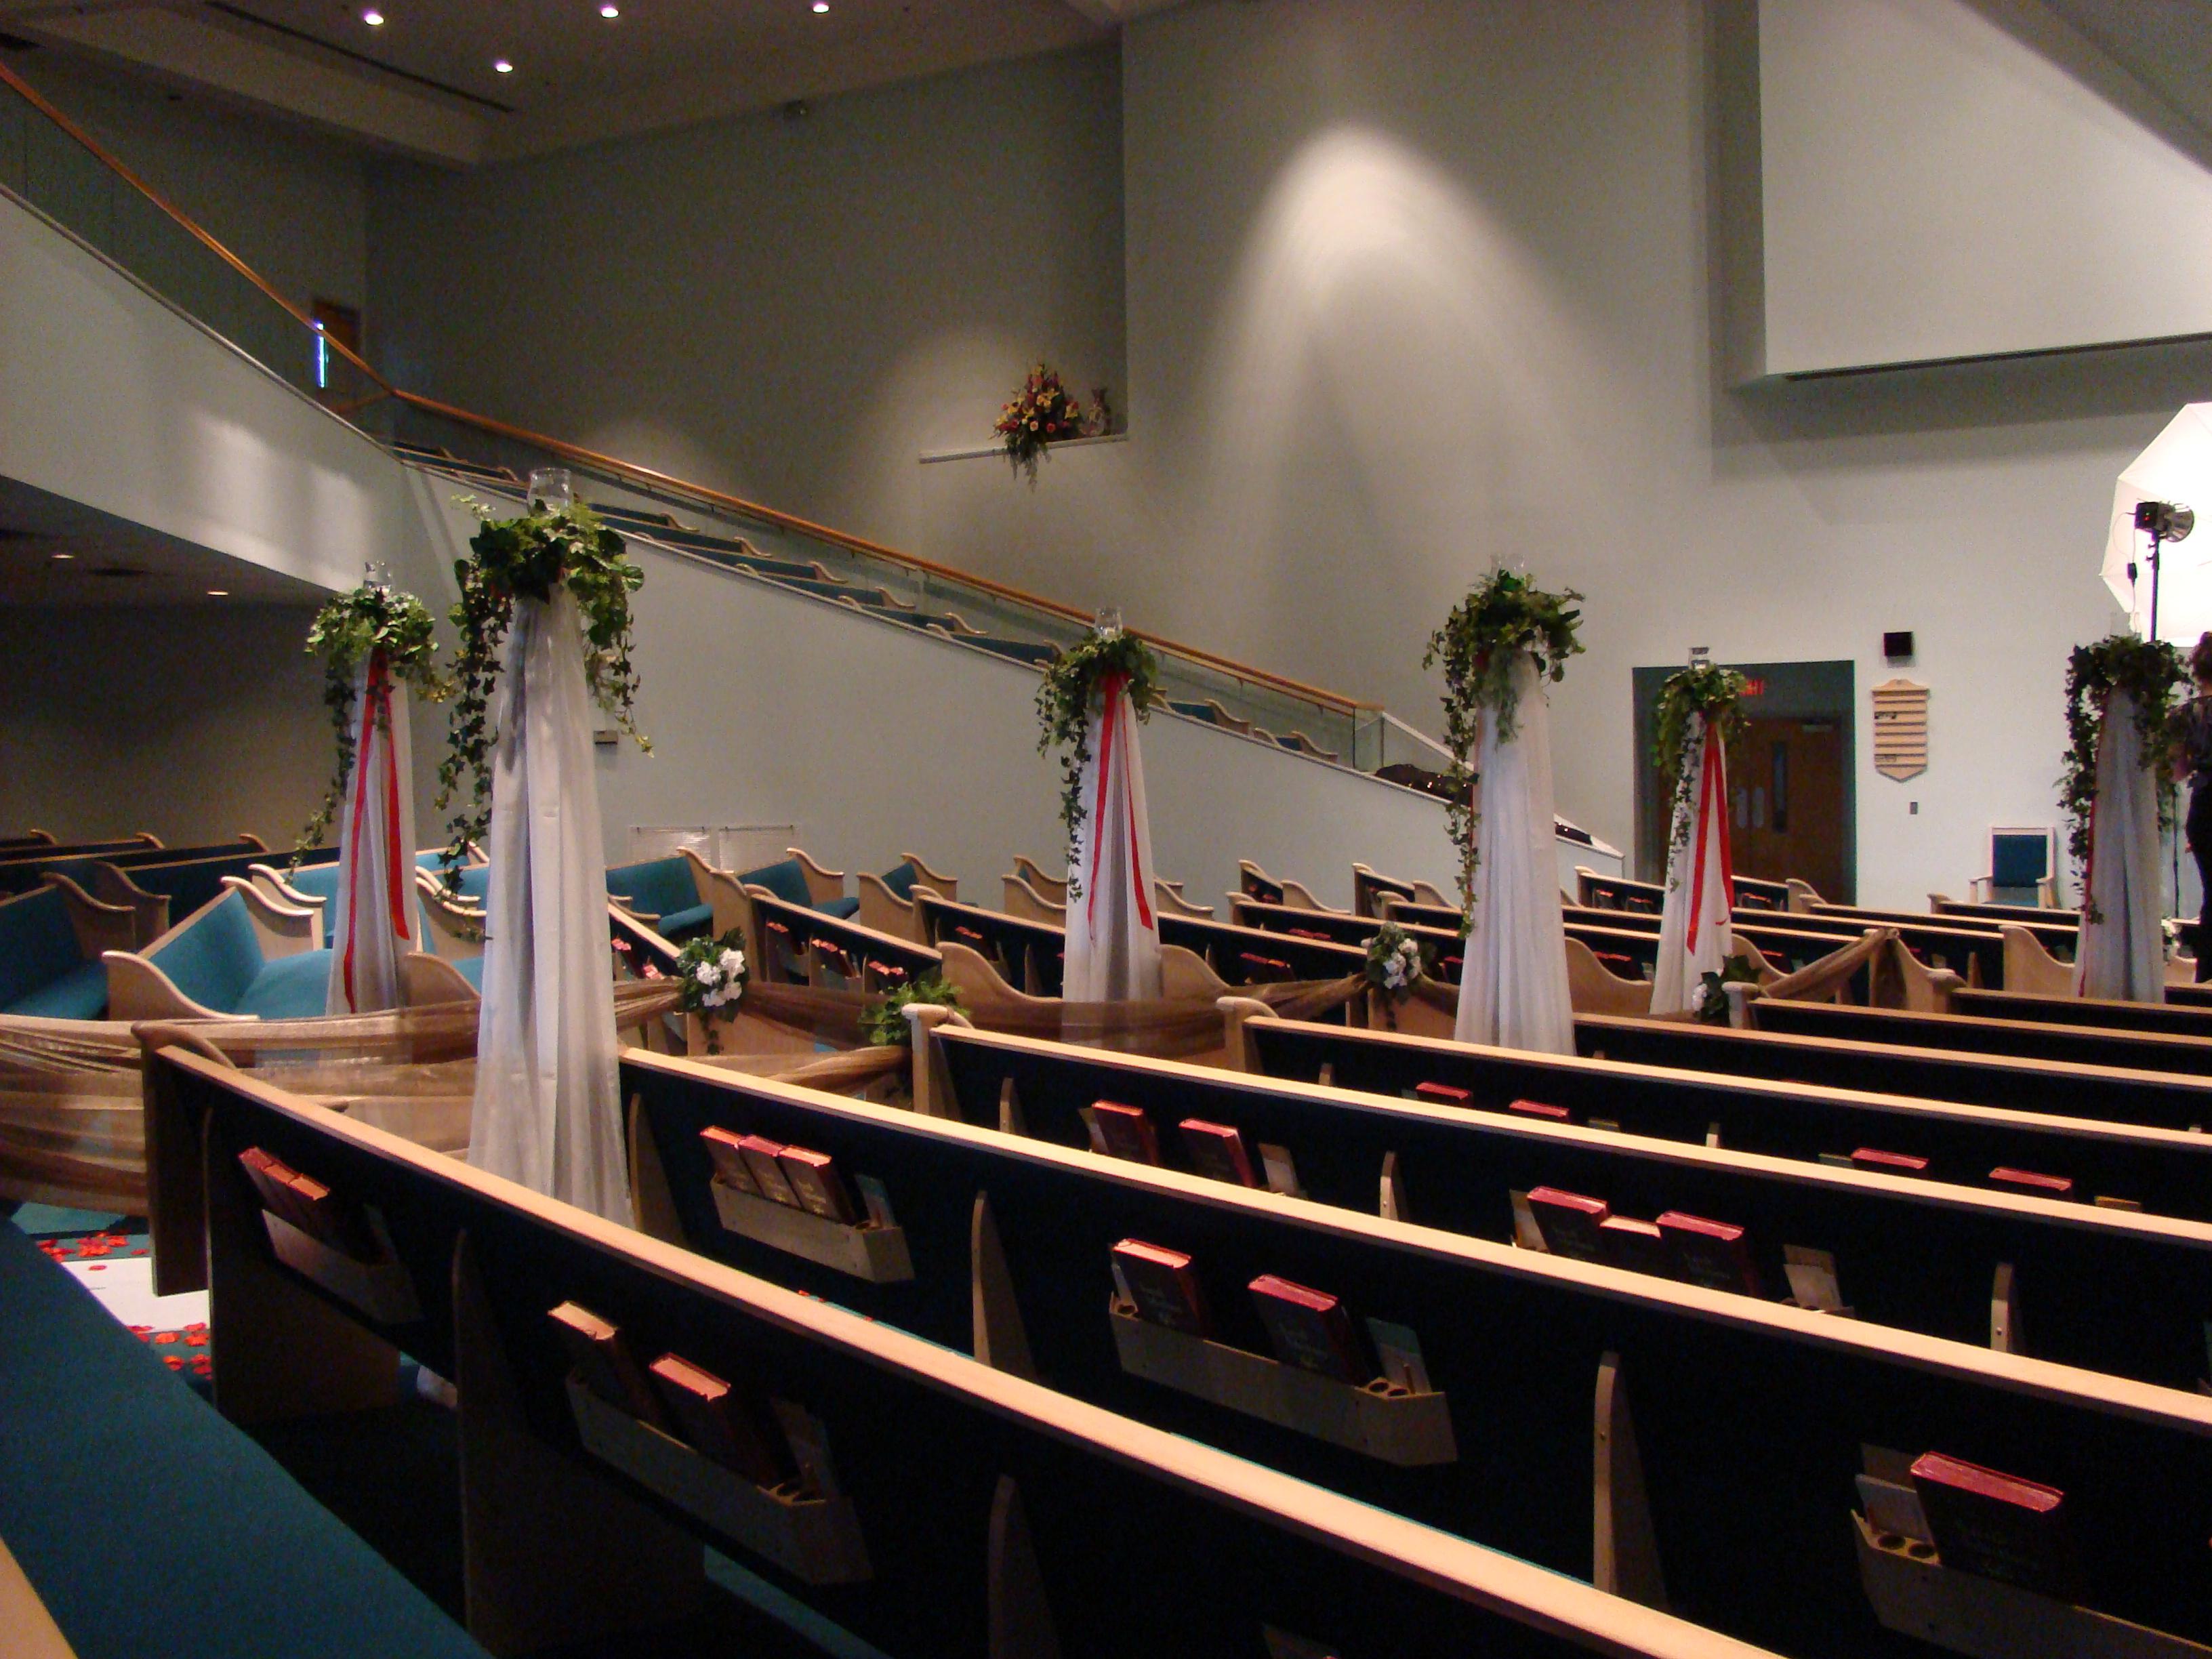 schaderLane church of christ AimeeBighem Dec29 07007